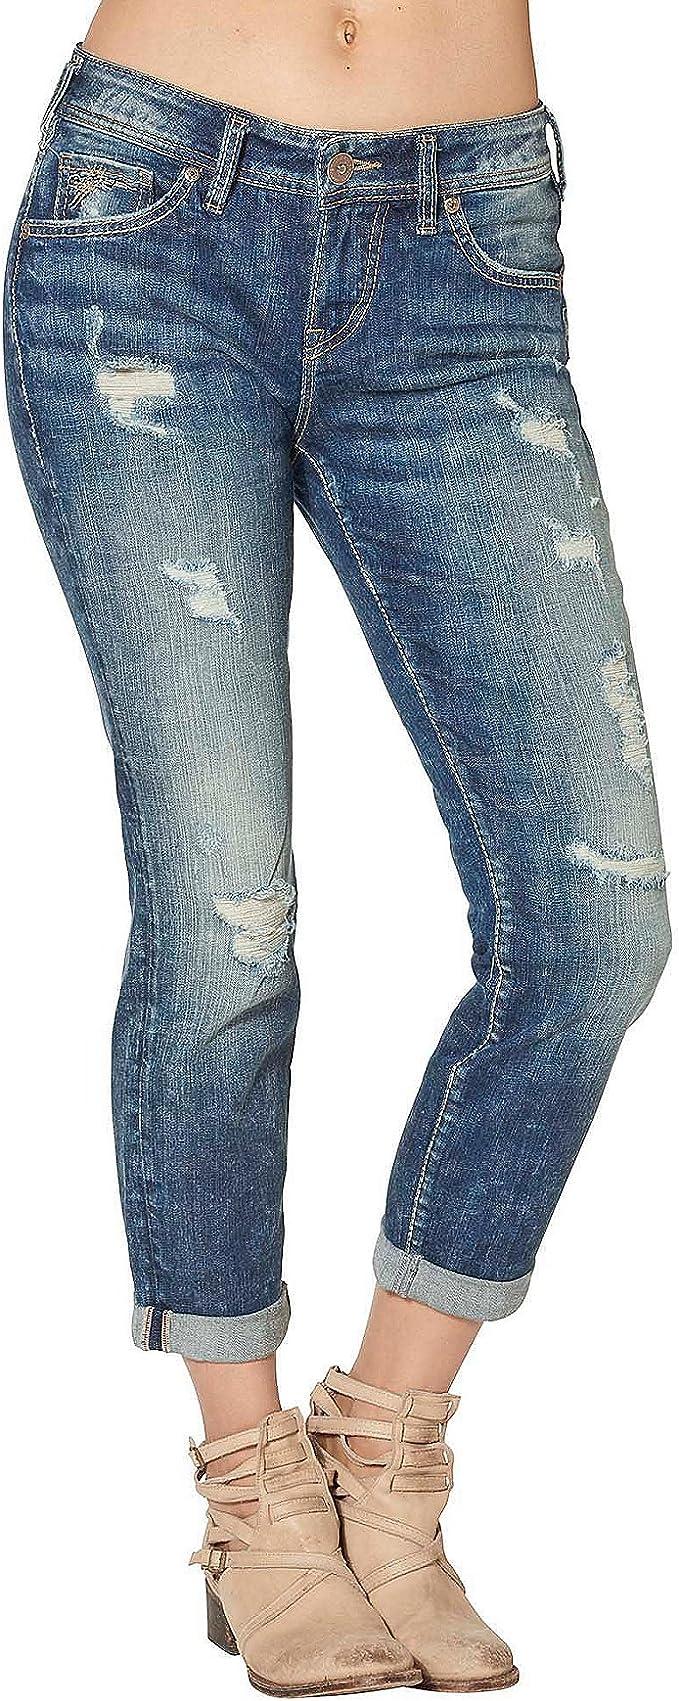 Silver Sam Boyfriend Slim Leg Mid Rise Jeans 35 X 29 Women's Jeans Brand New